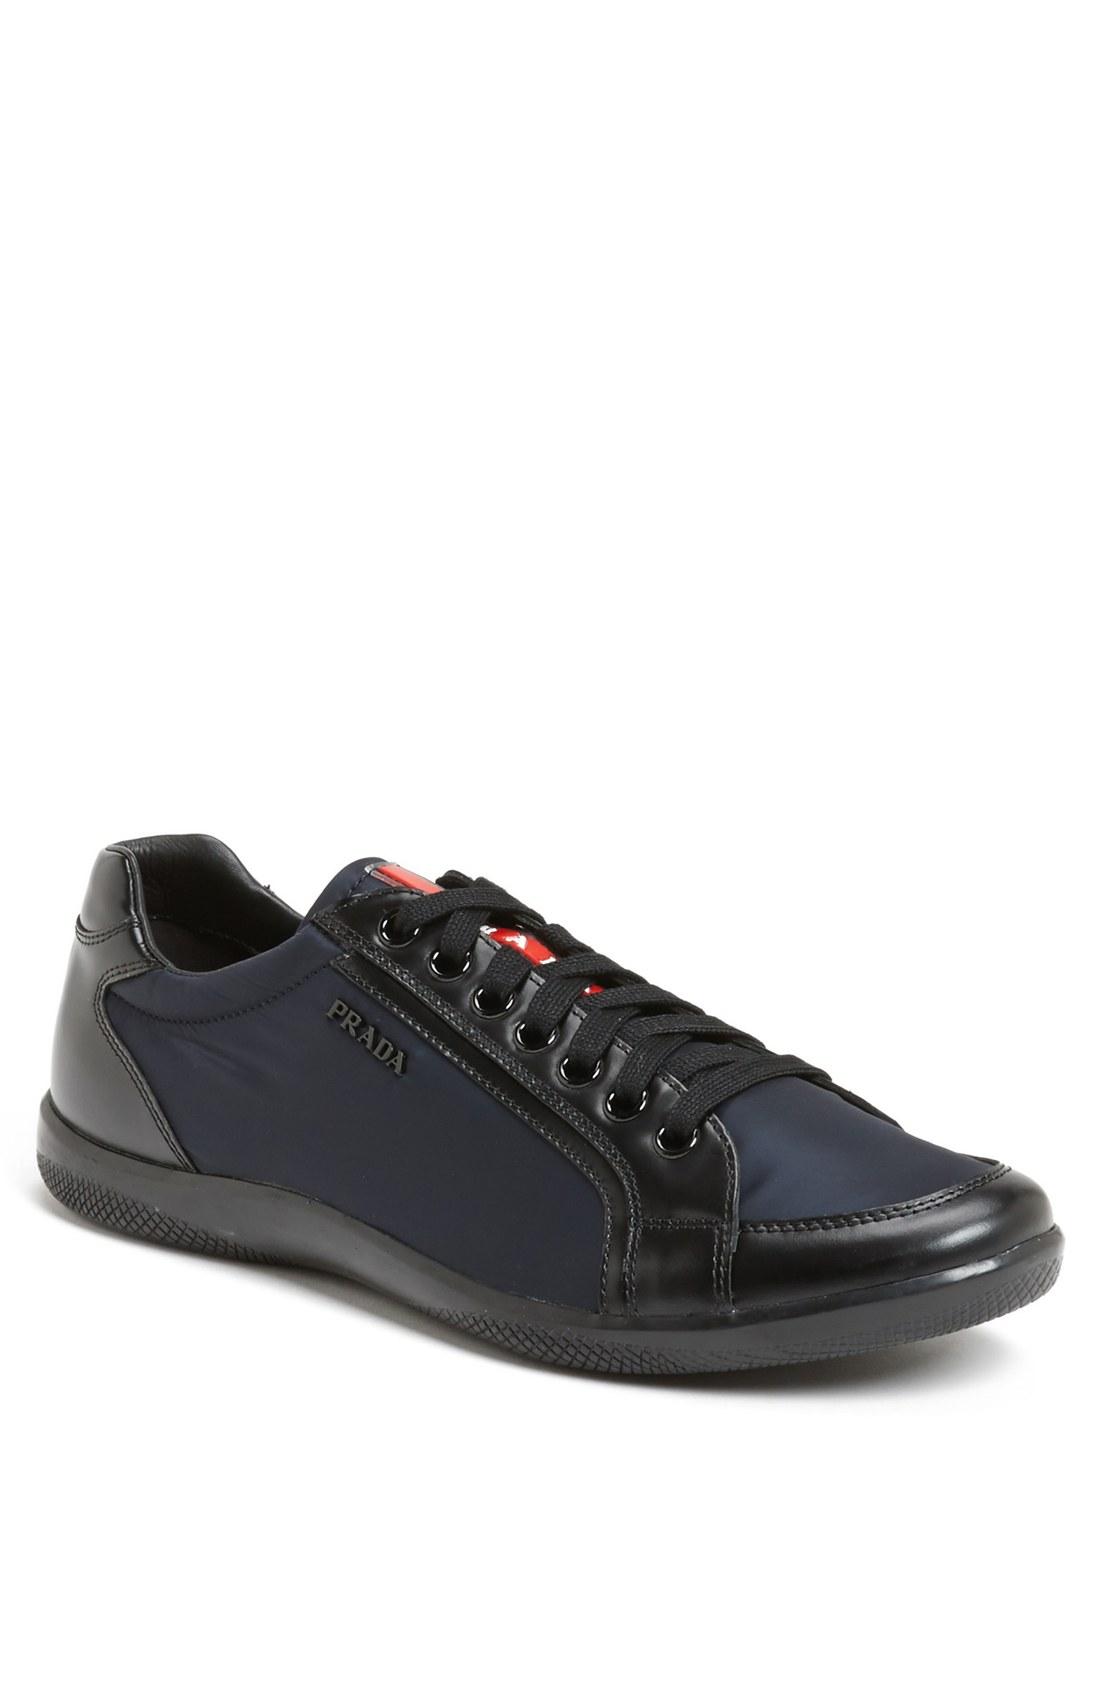 Prada Offshore Low Profile Sneaker In Black For Men Blue